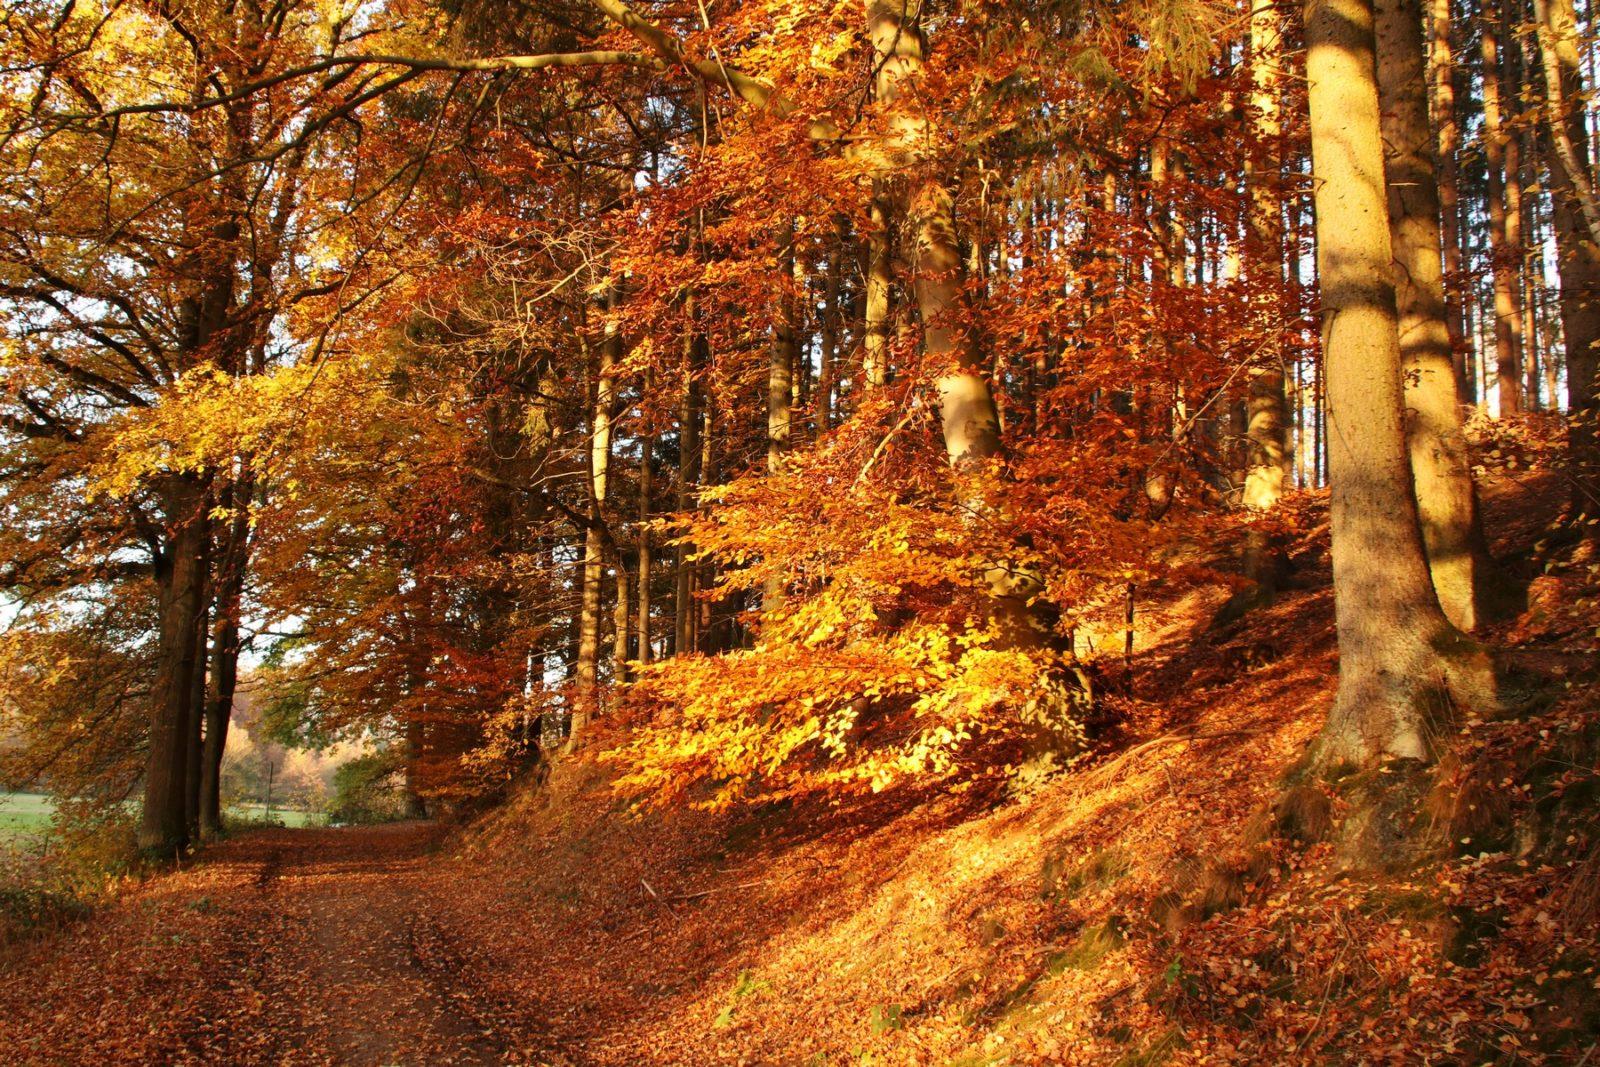 Herbstspaziergang im Passadetal Voßheide © Renate Mahnert